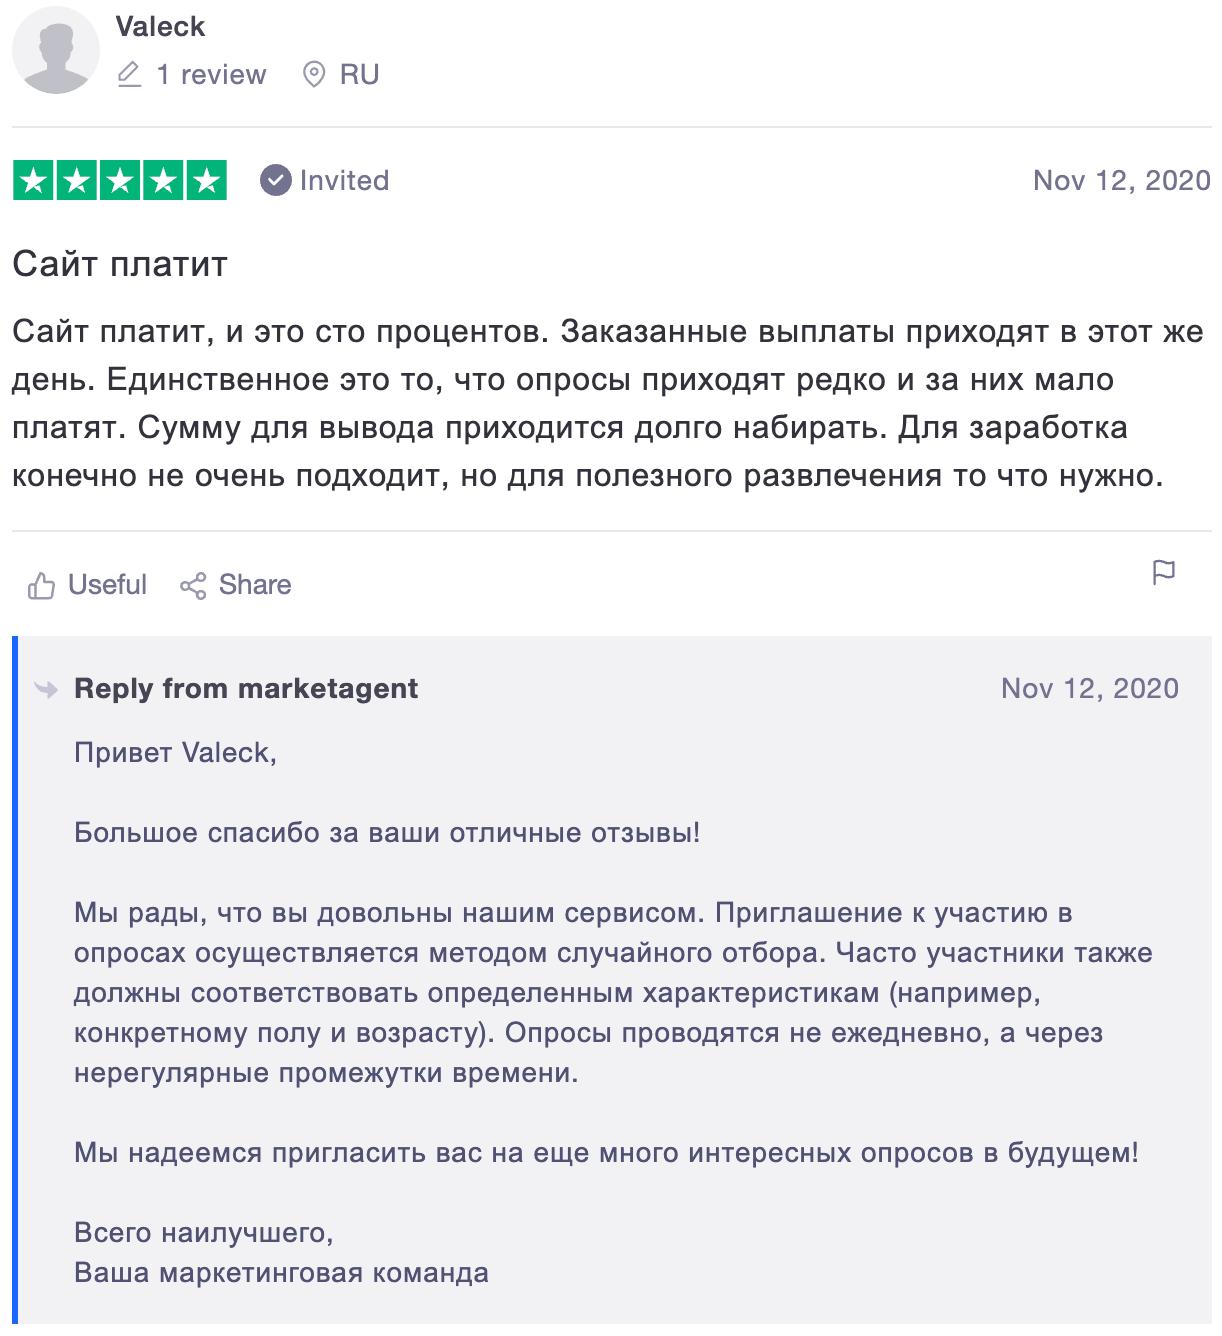 отзывы опросы marketagent